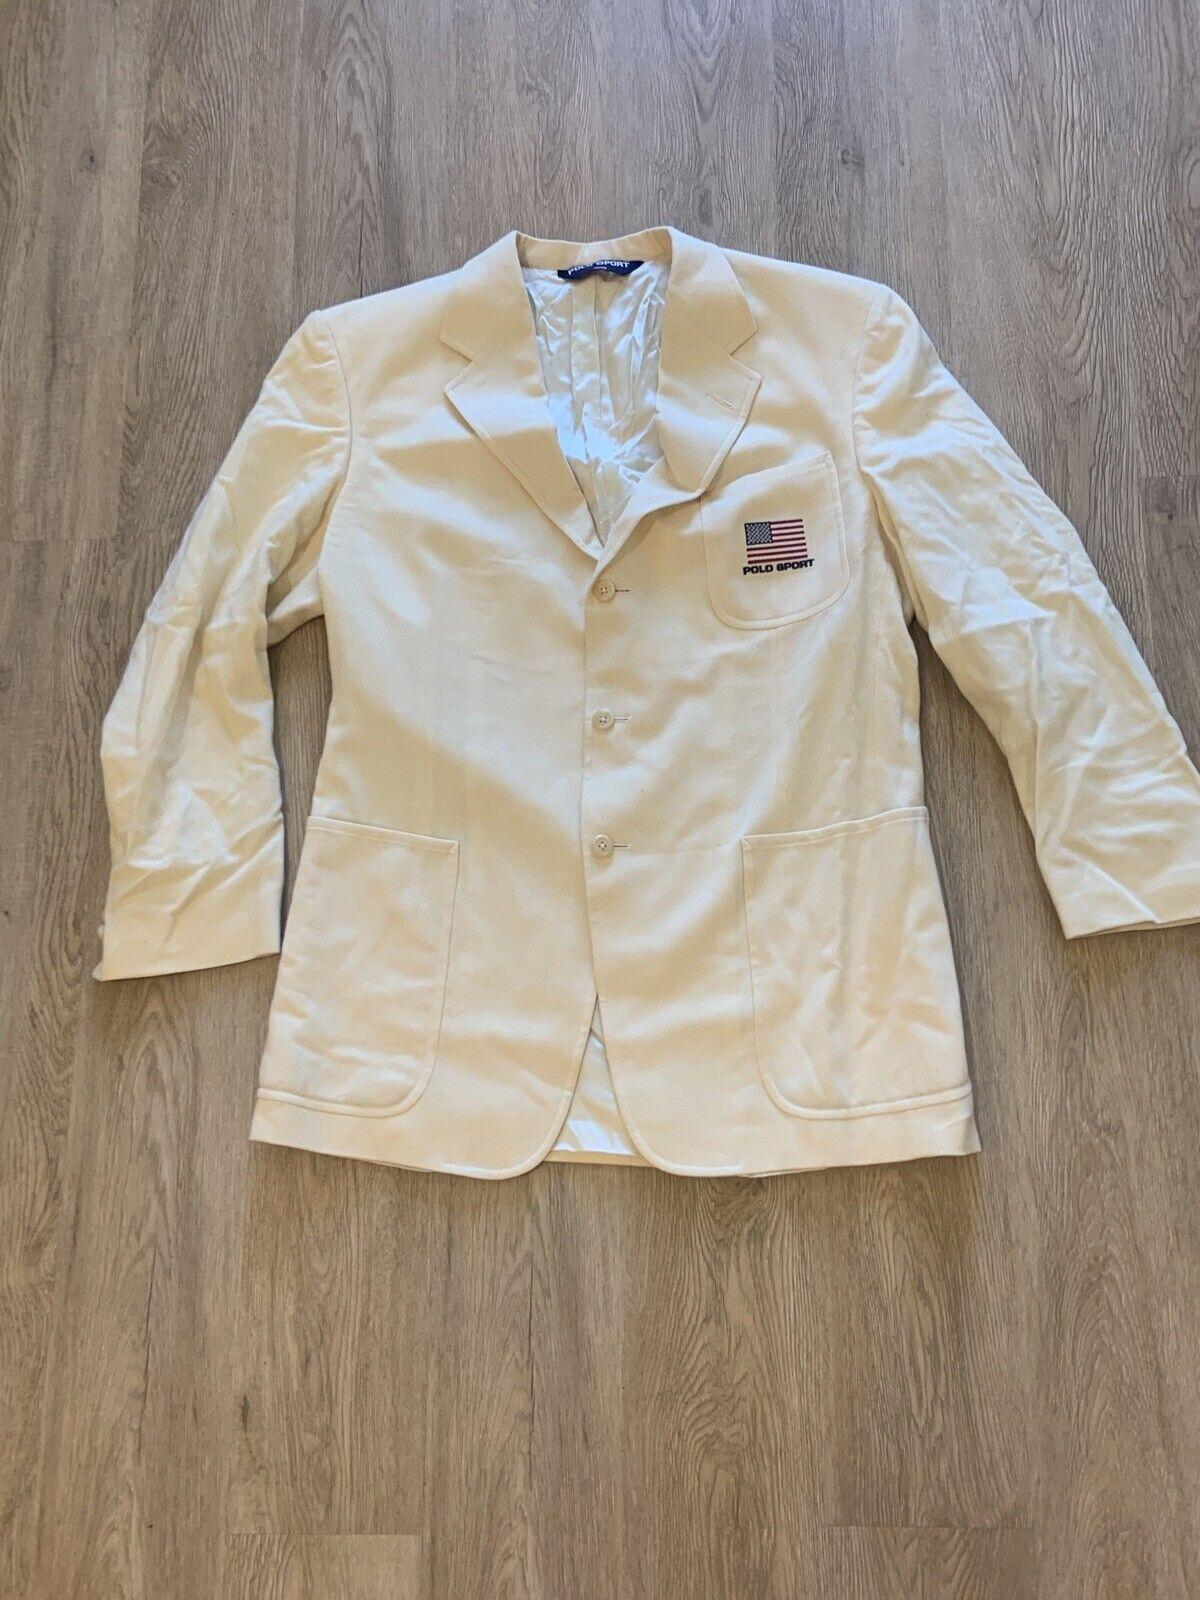 Vintage Polo Sport Sport Jacket - image 2